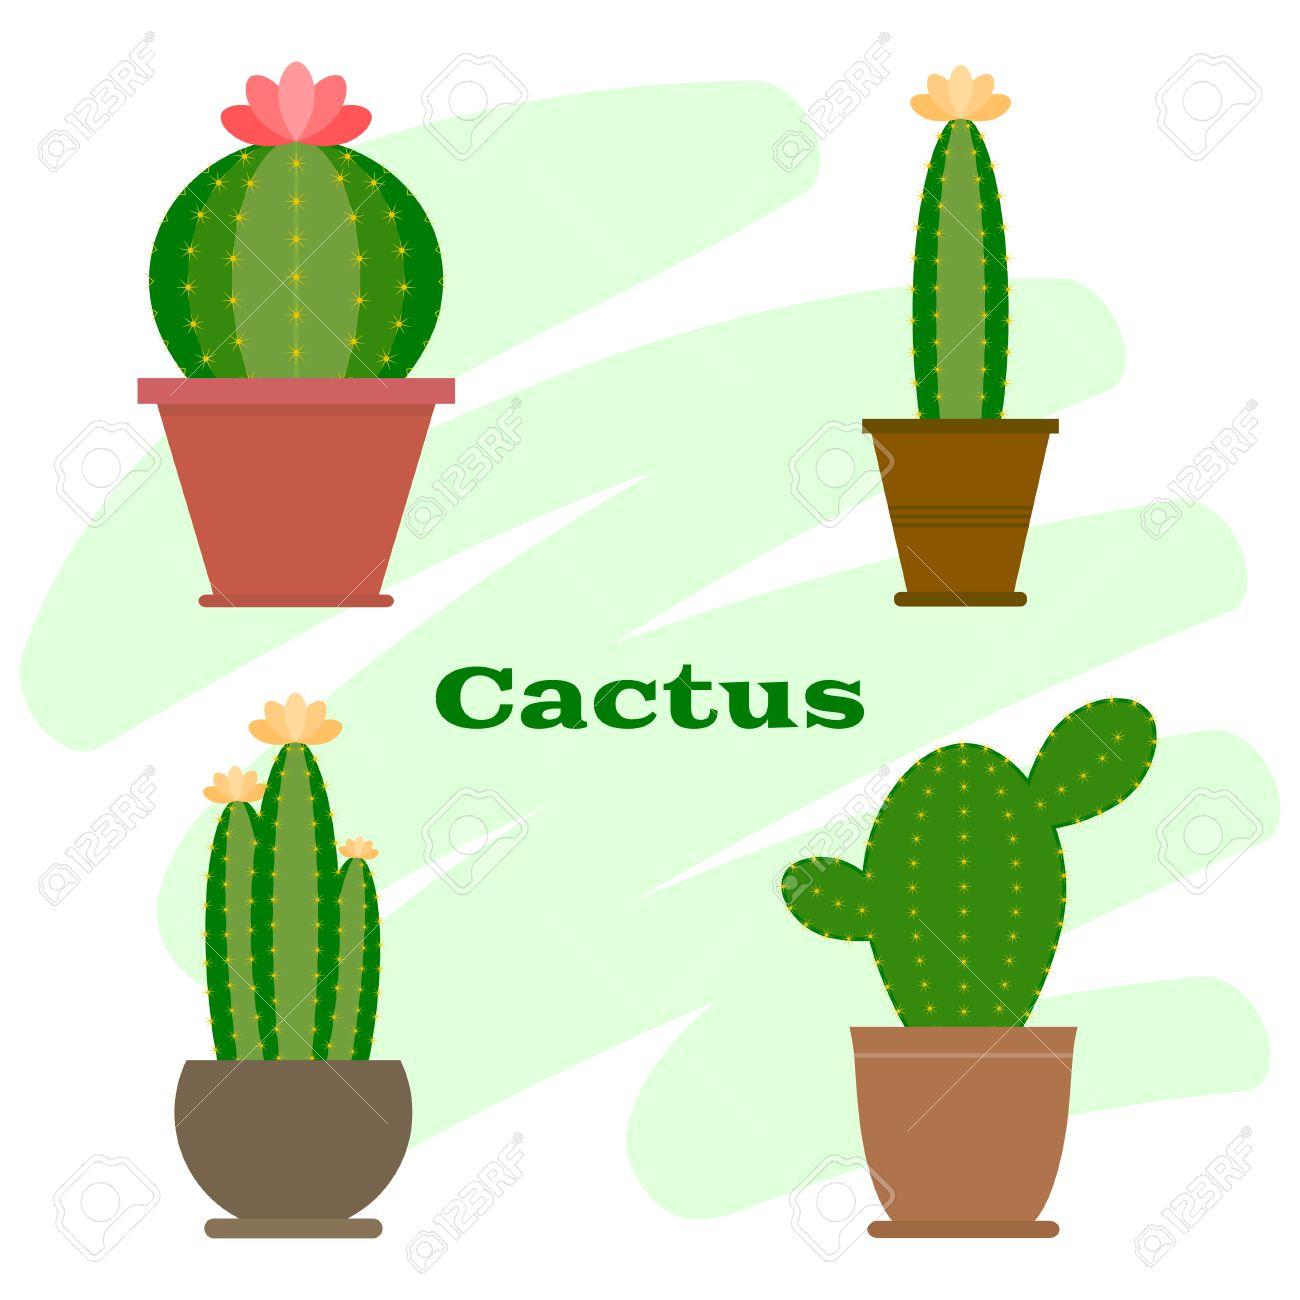 Set Kaktus Im Blumentopf Cactus Symbol Cartoon Cactus Illustration